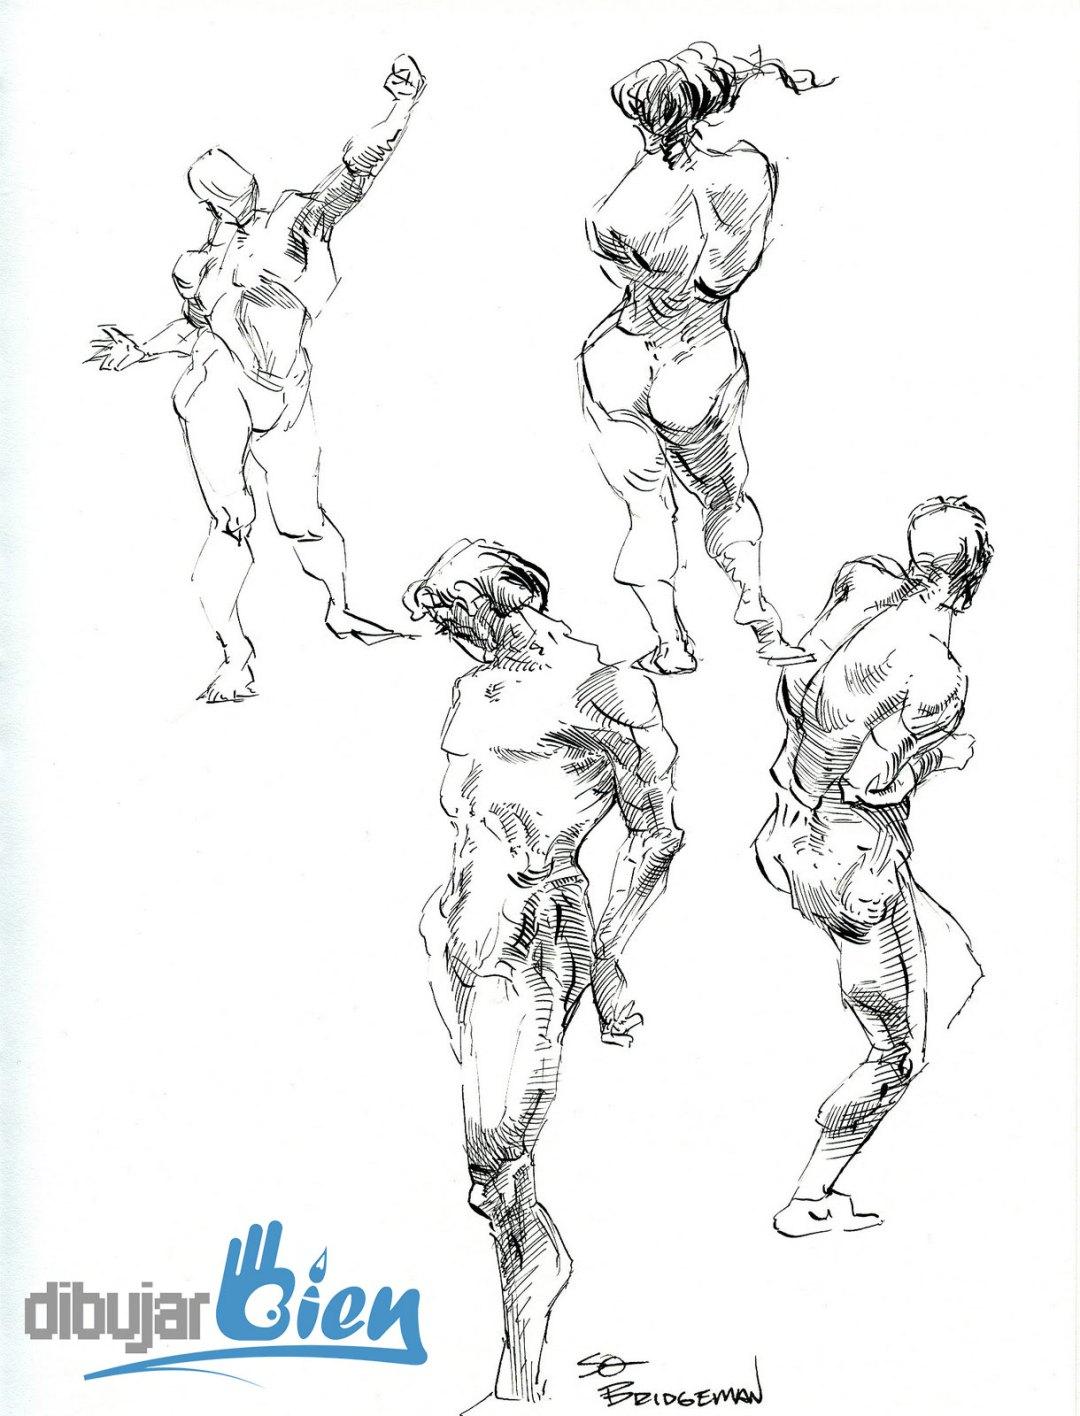 Libros para dibujar anatomía: George Bridgman